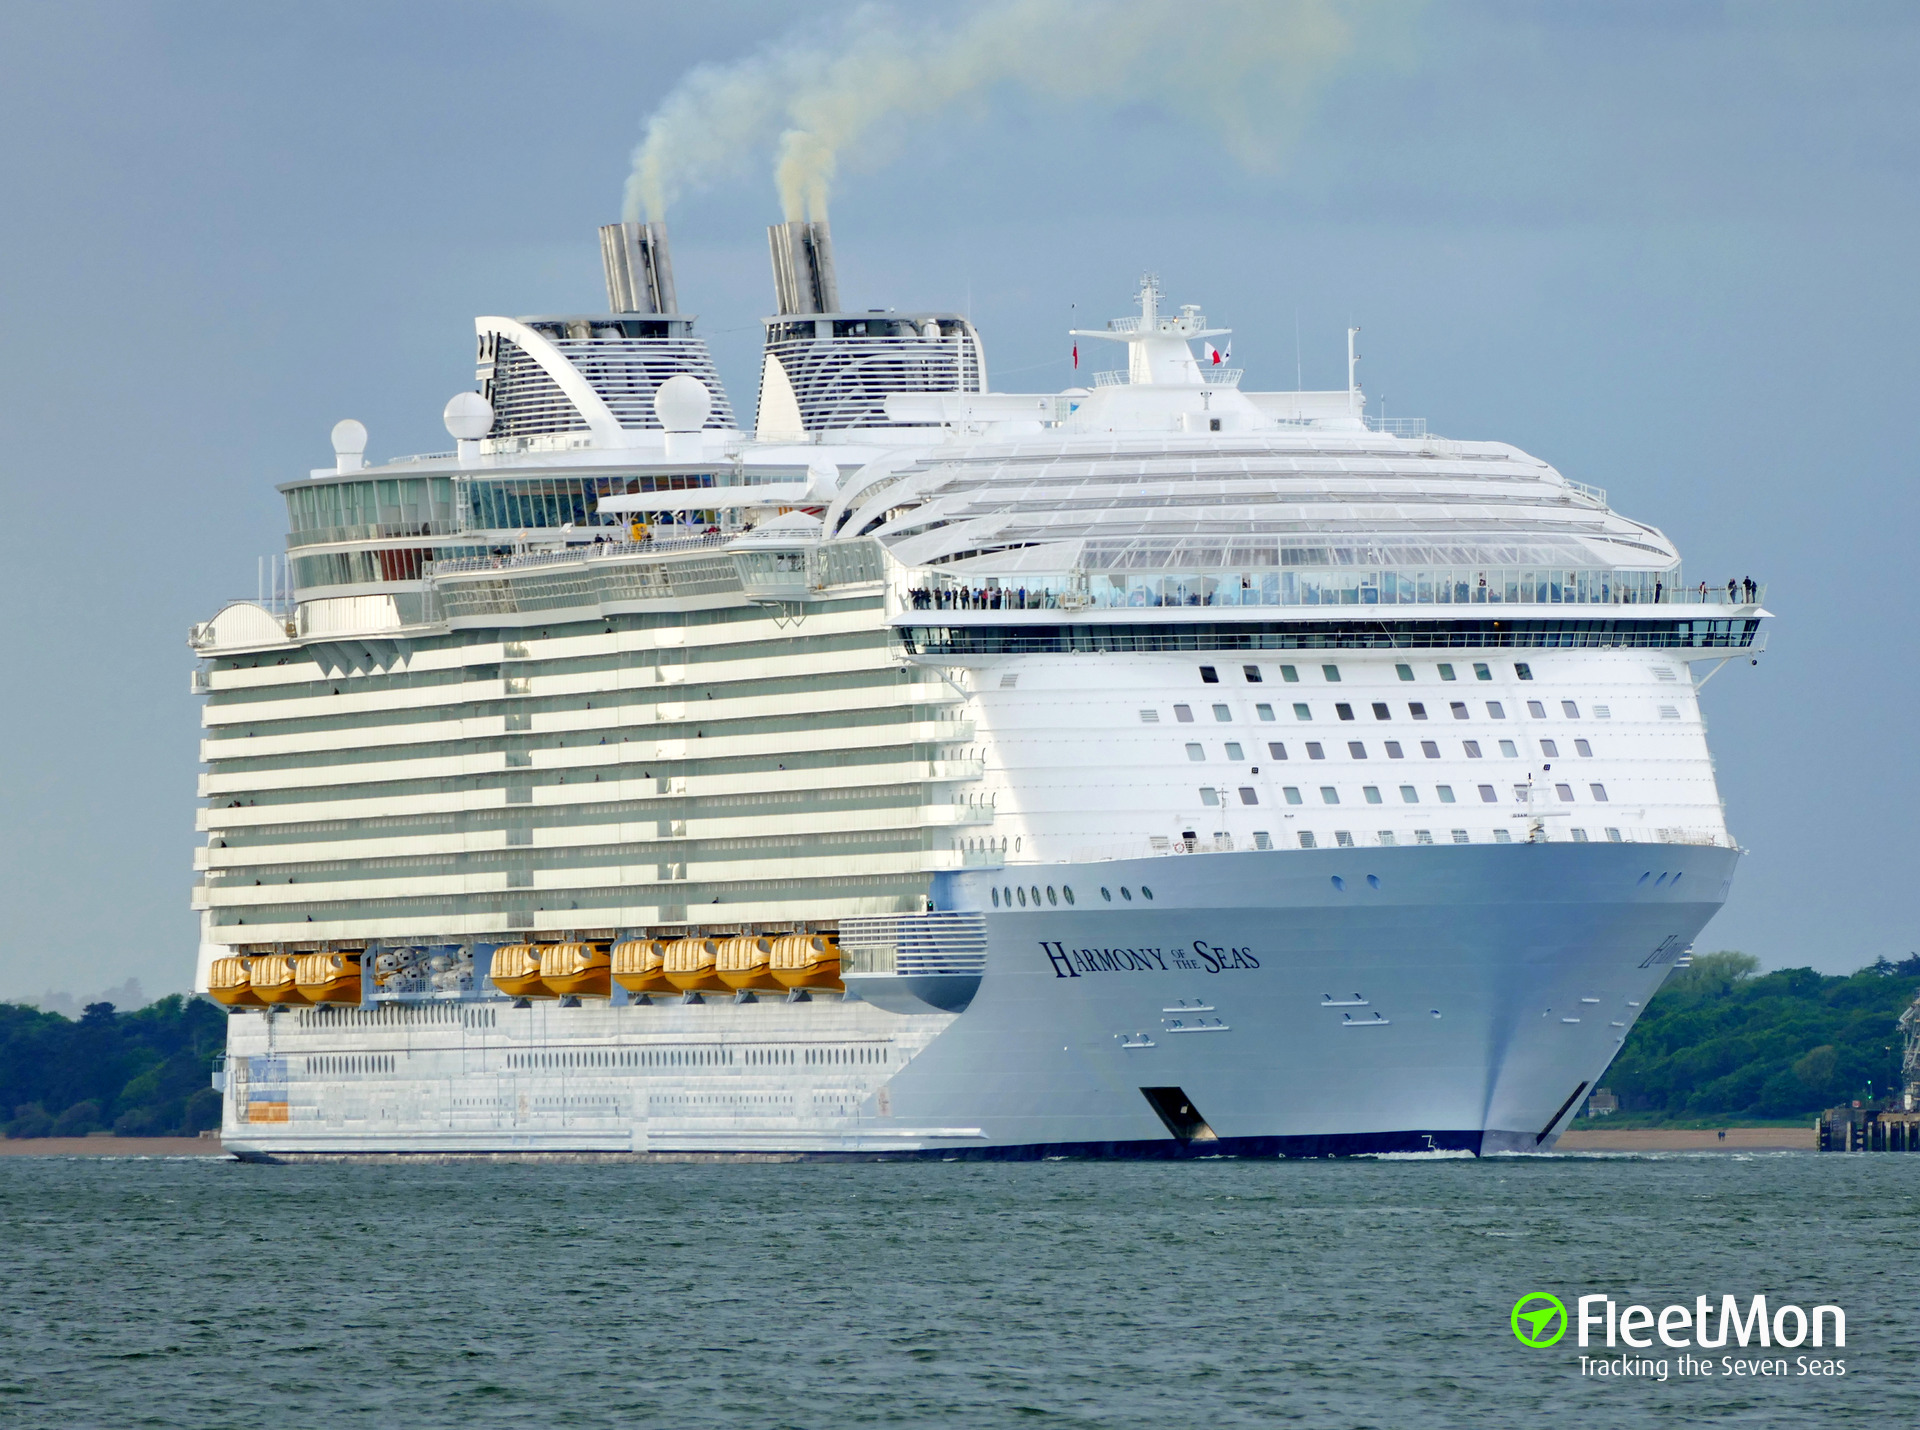 Photo Of Harmony Of The Seas Imo 9682875 Mmsi 311000396